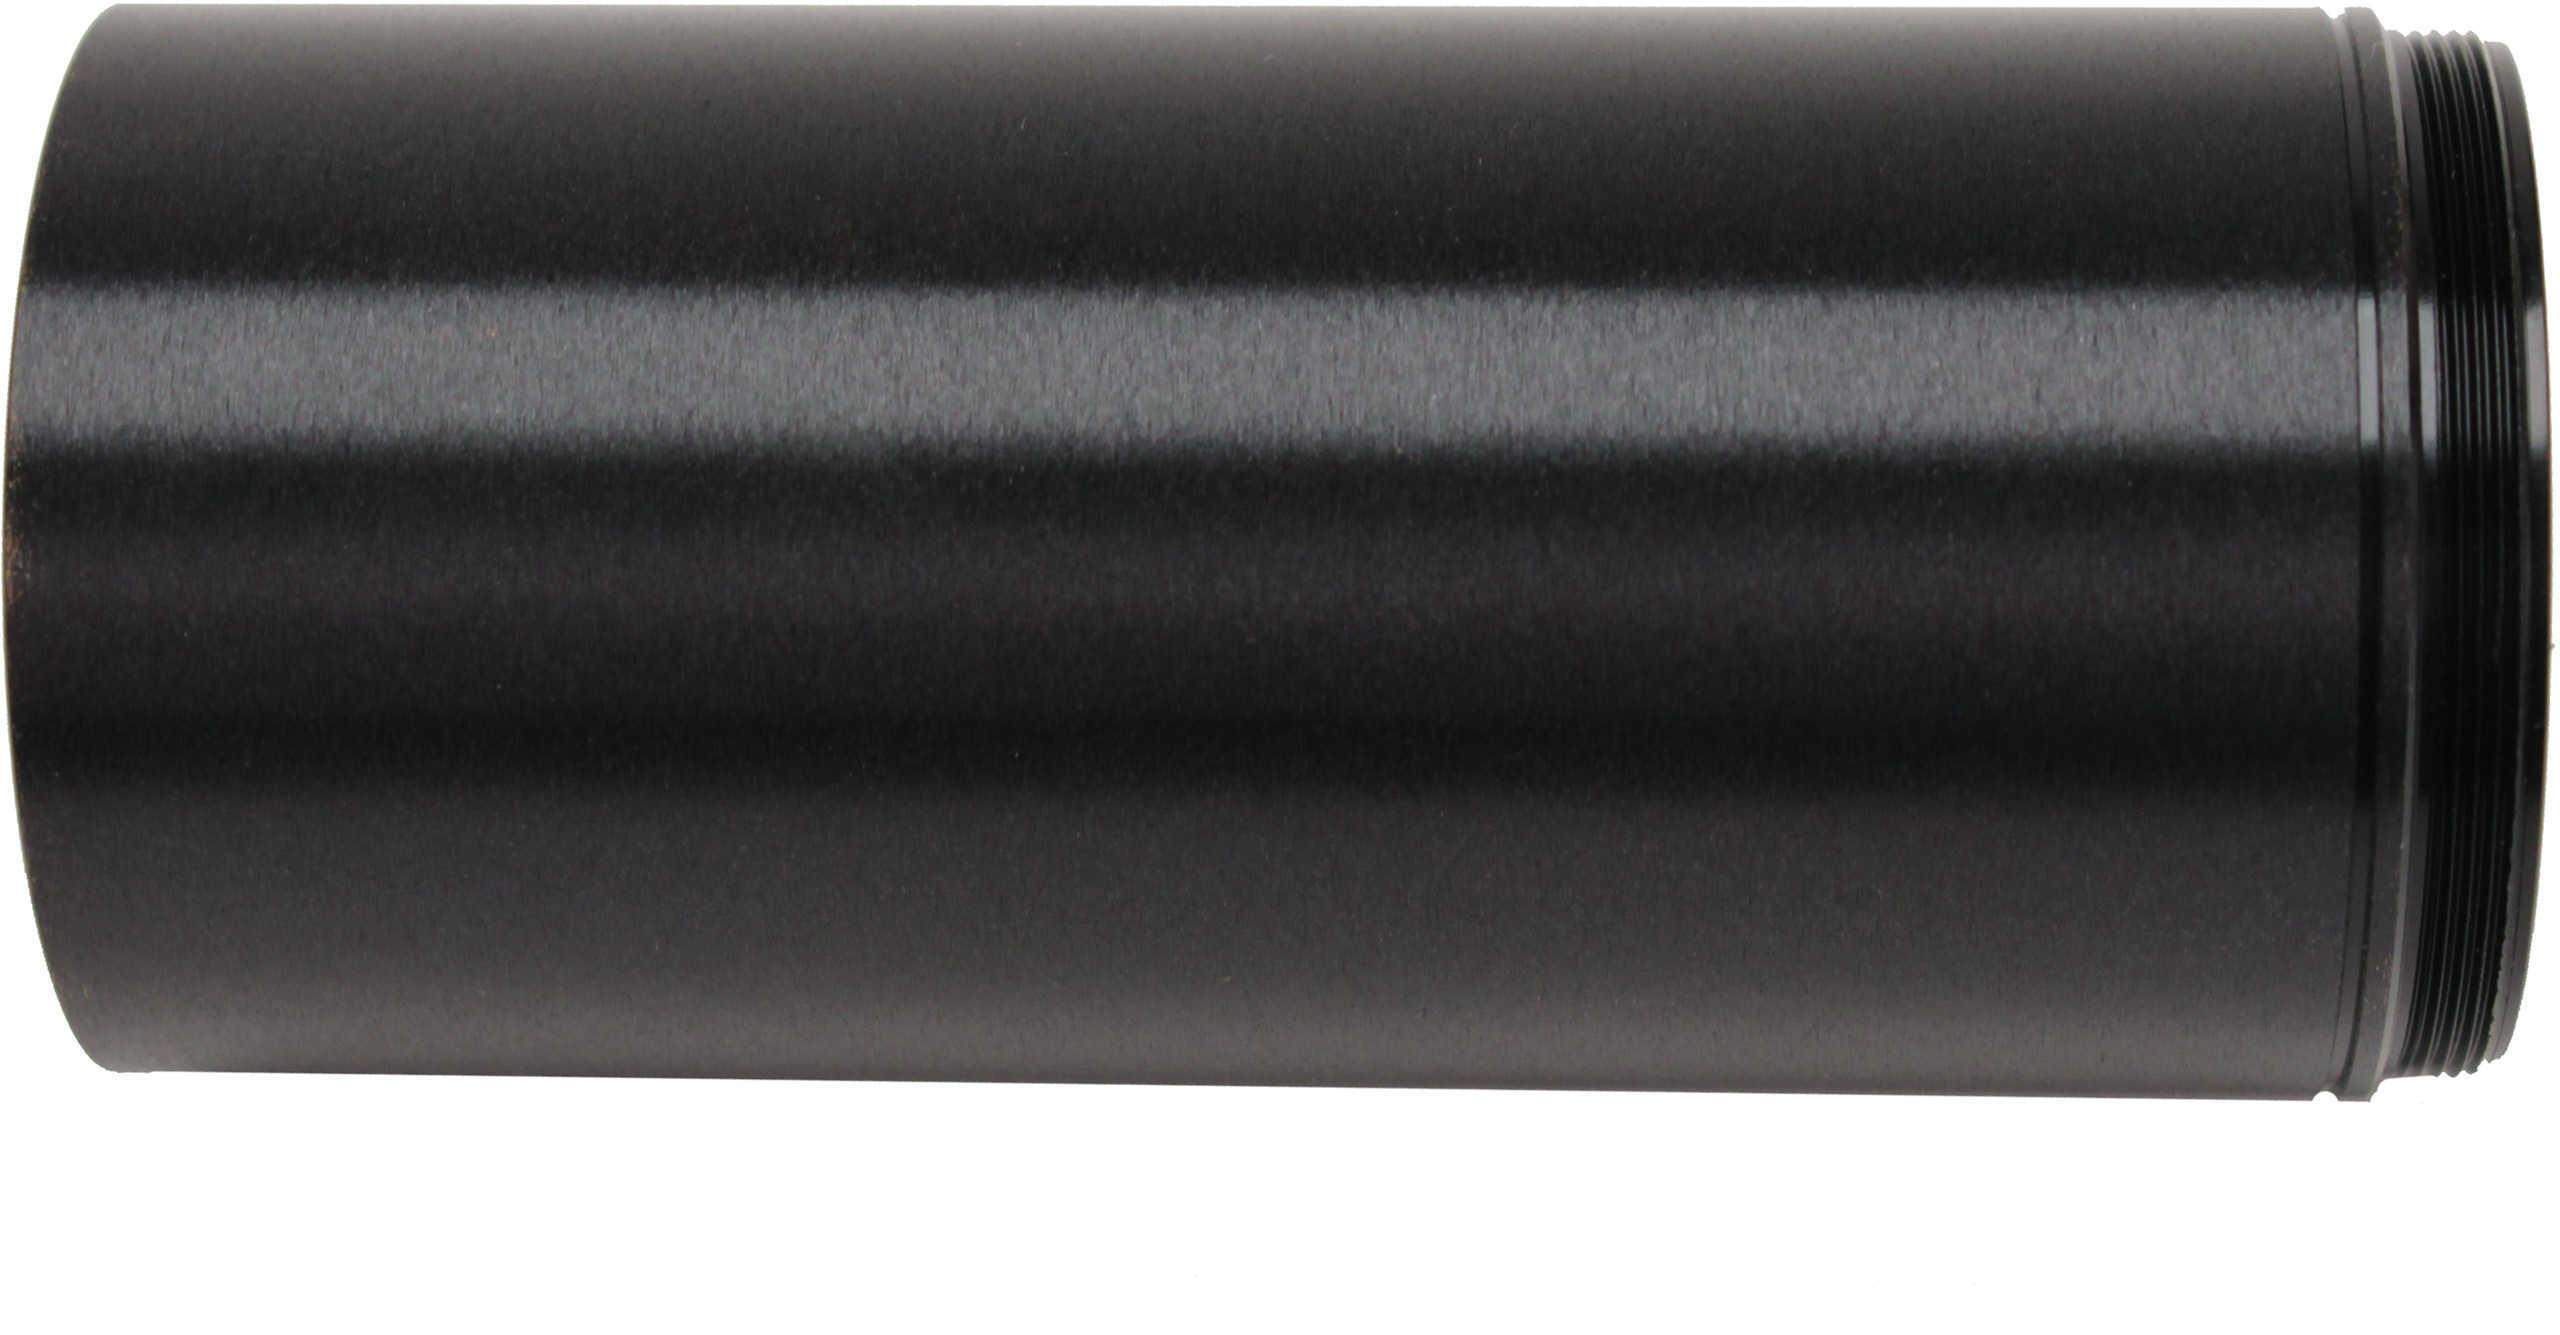 "Leupold Scope Smith Lens Shade Lens Shade 2.5"" 50mm Matte Black Md: 52350"